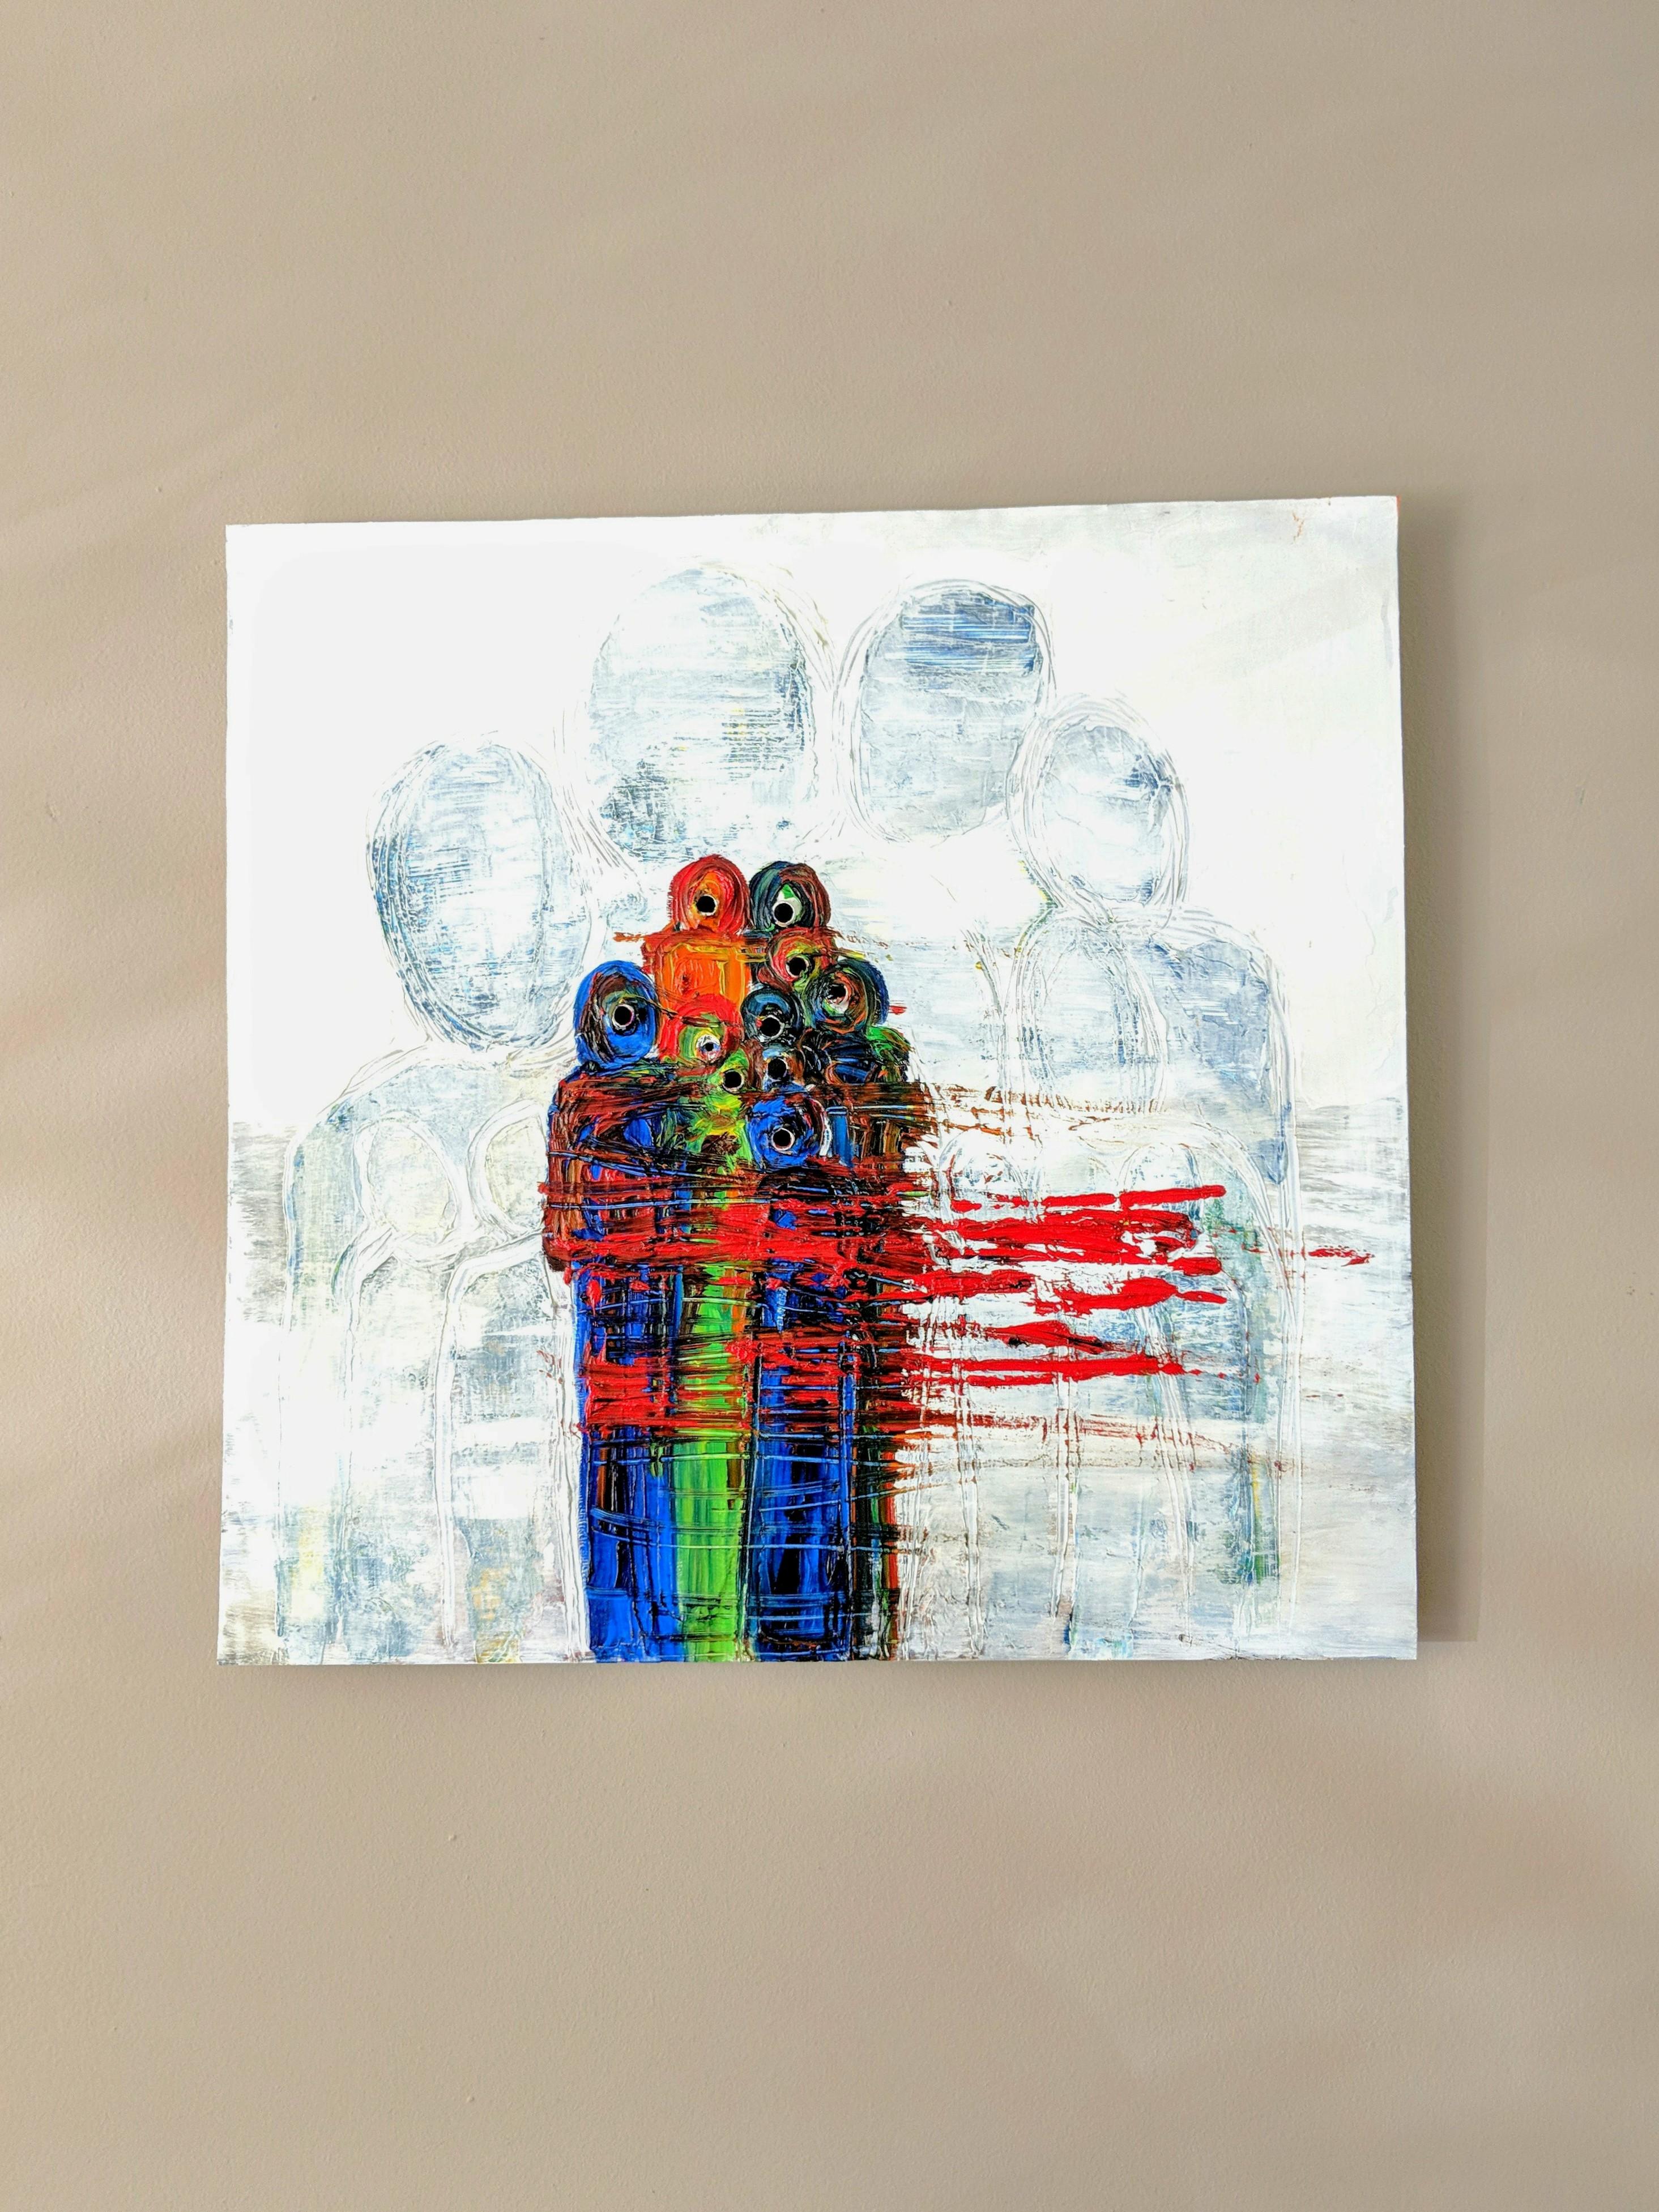 Untitled artwork by Noura Ali Ramahi - art listed for sale on Artplode